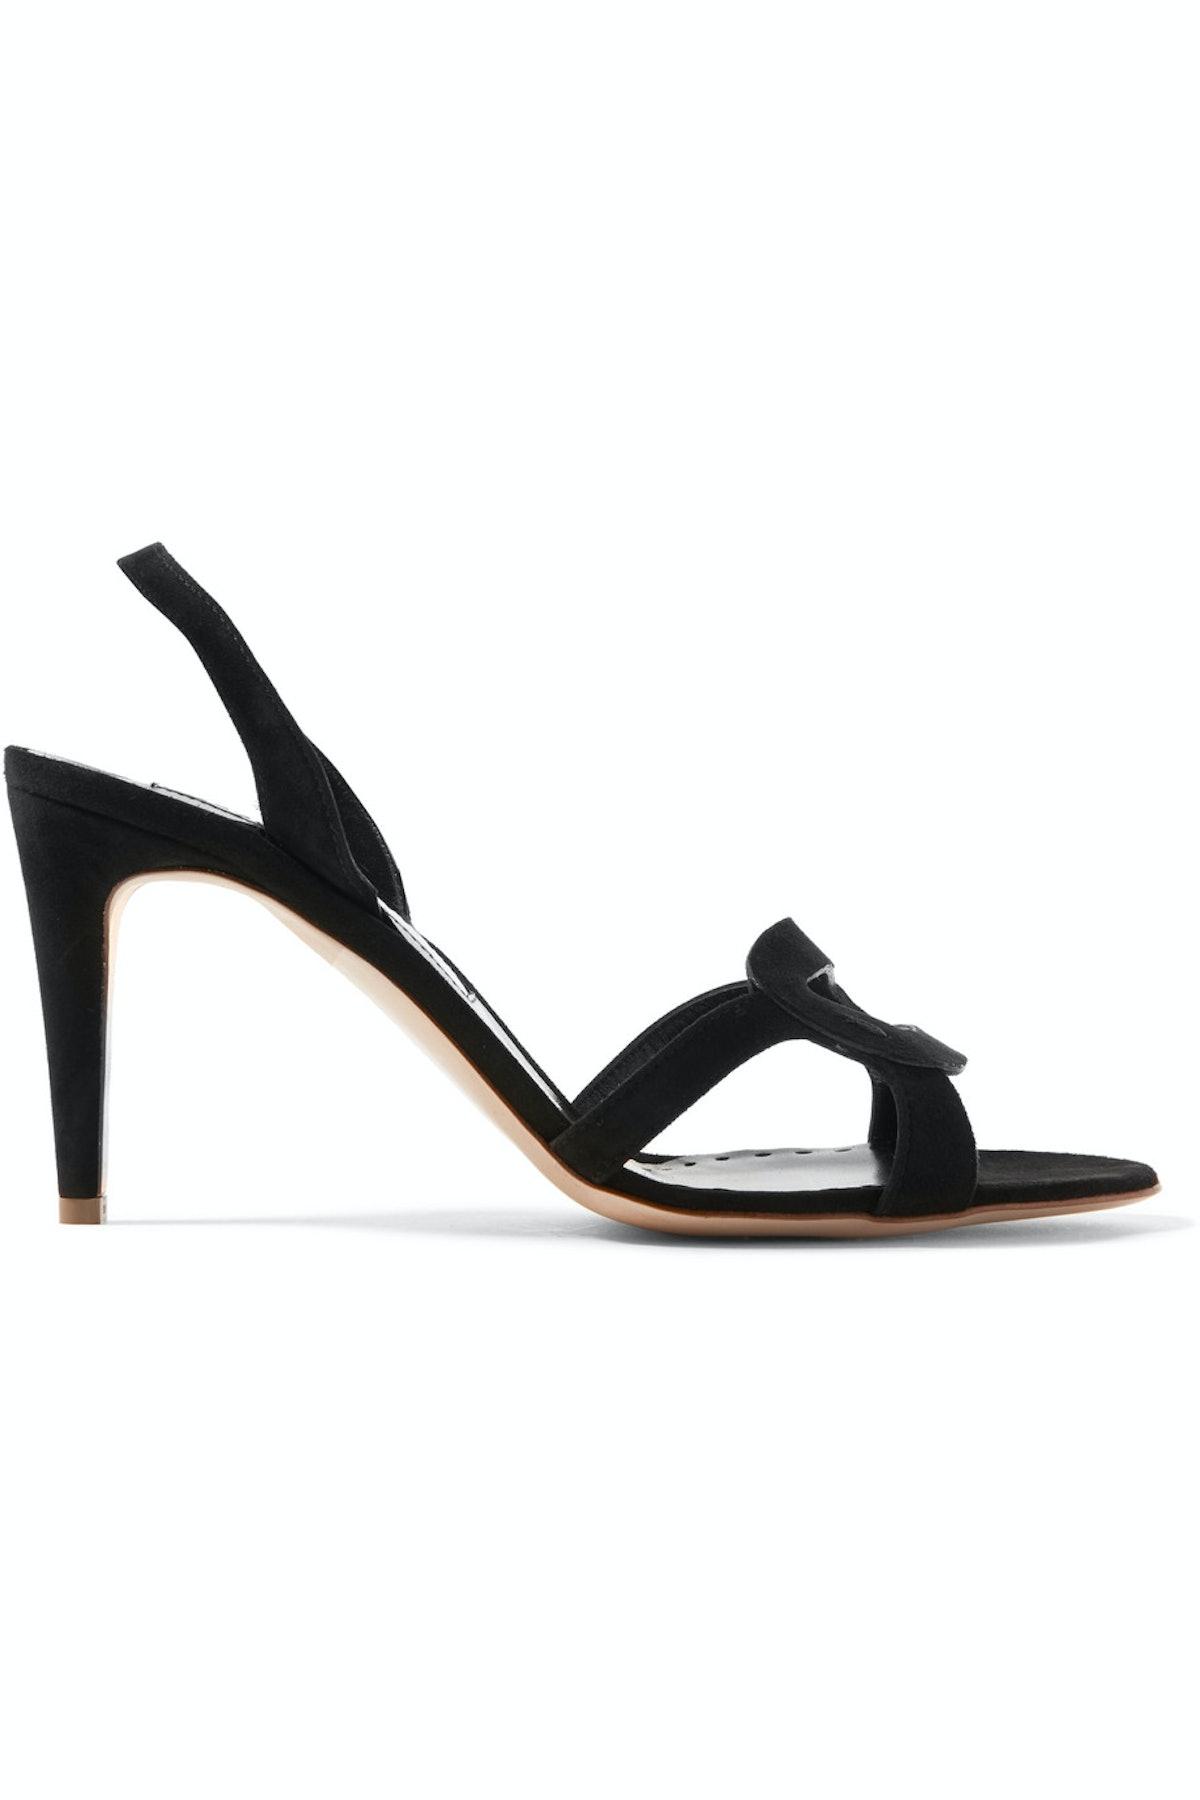 Aurora Suede Slingback Sandals